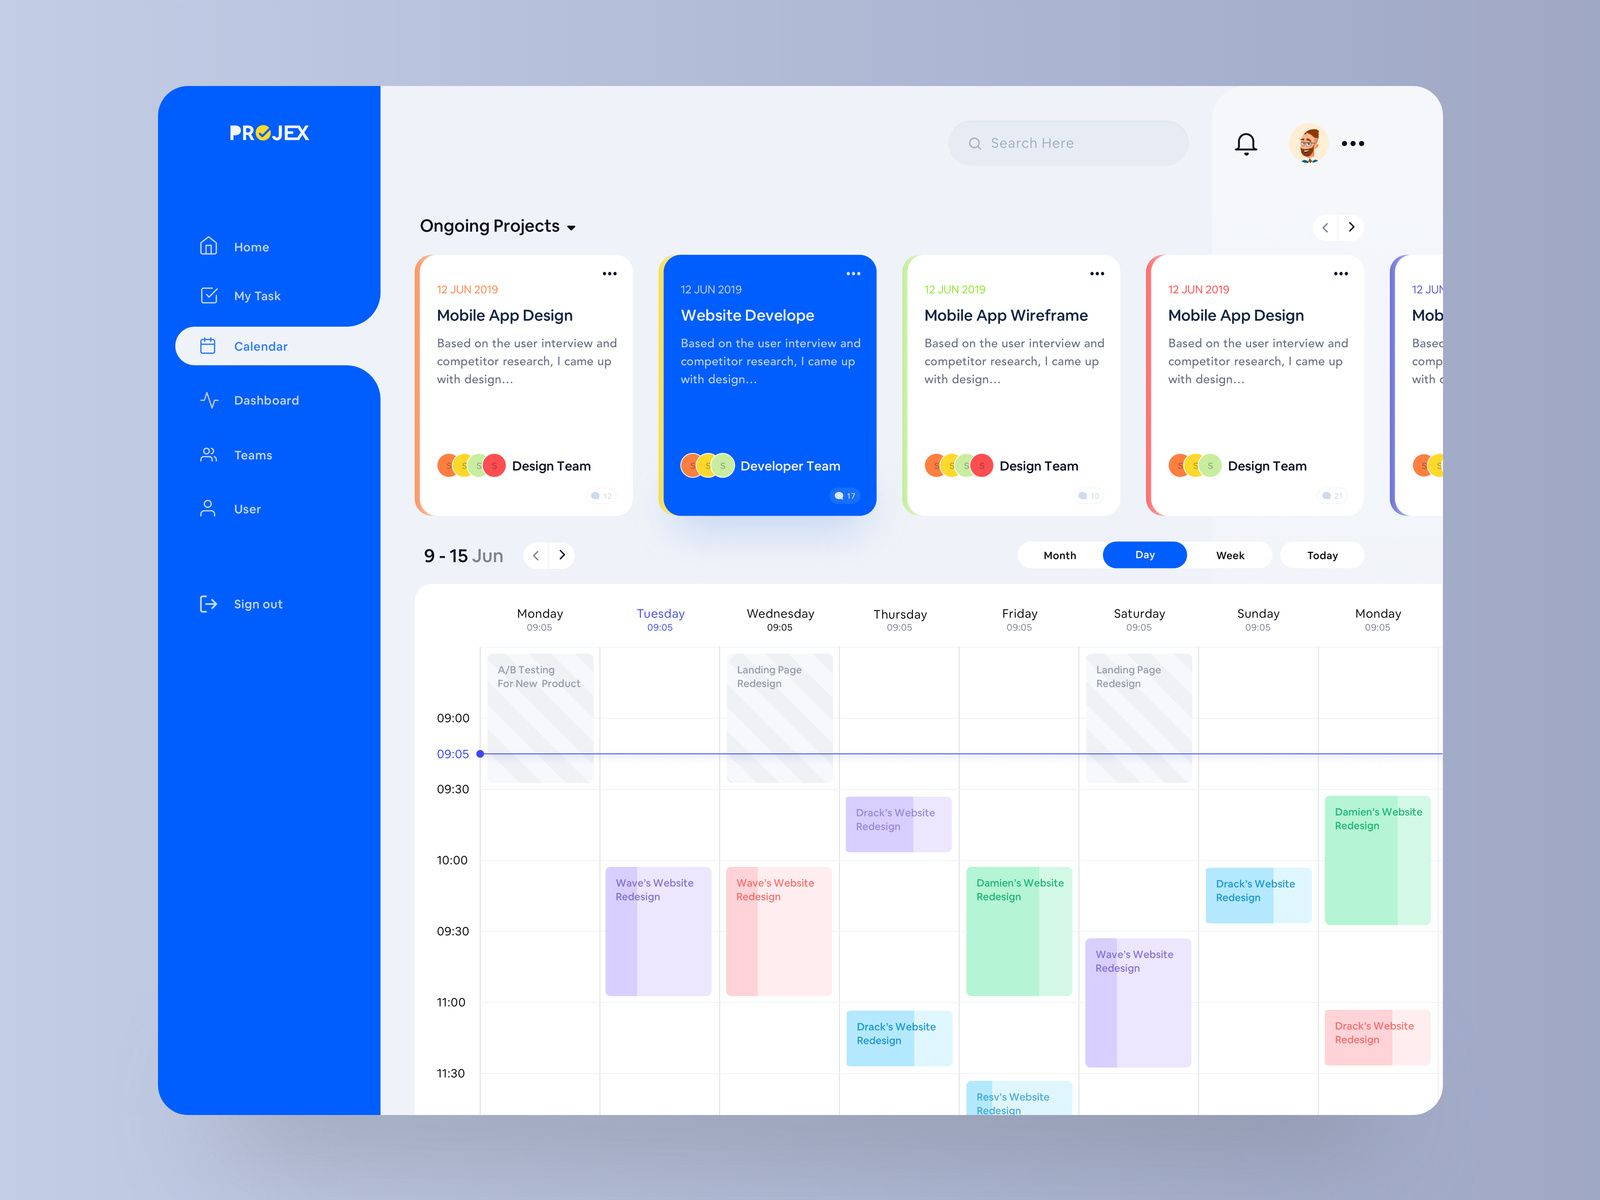 Project Management – Calendar